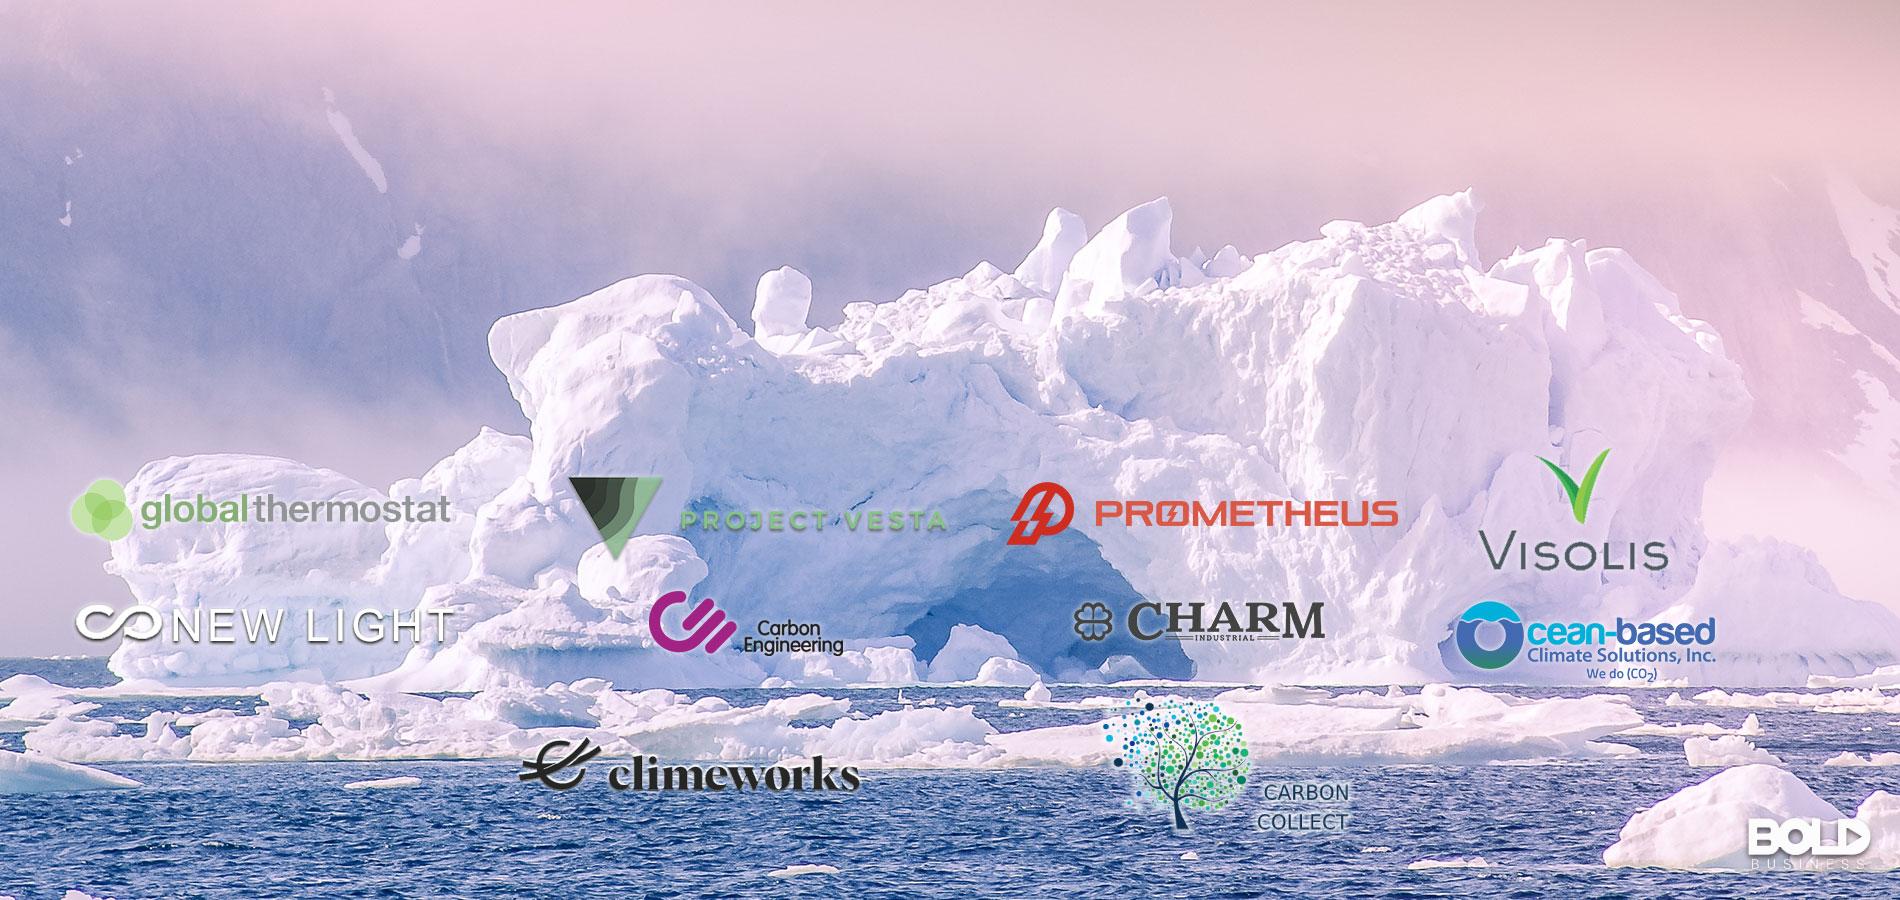 A bunch of company logos on an iceberg.